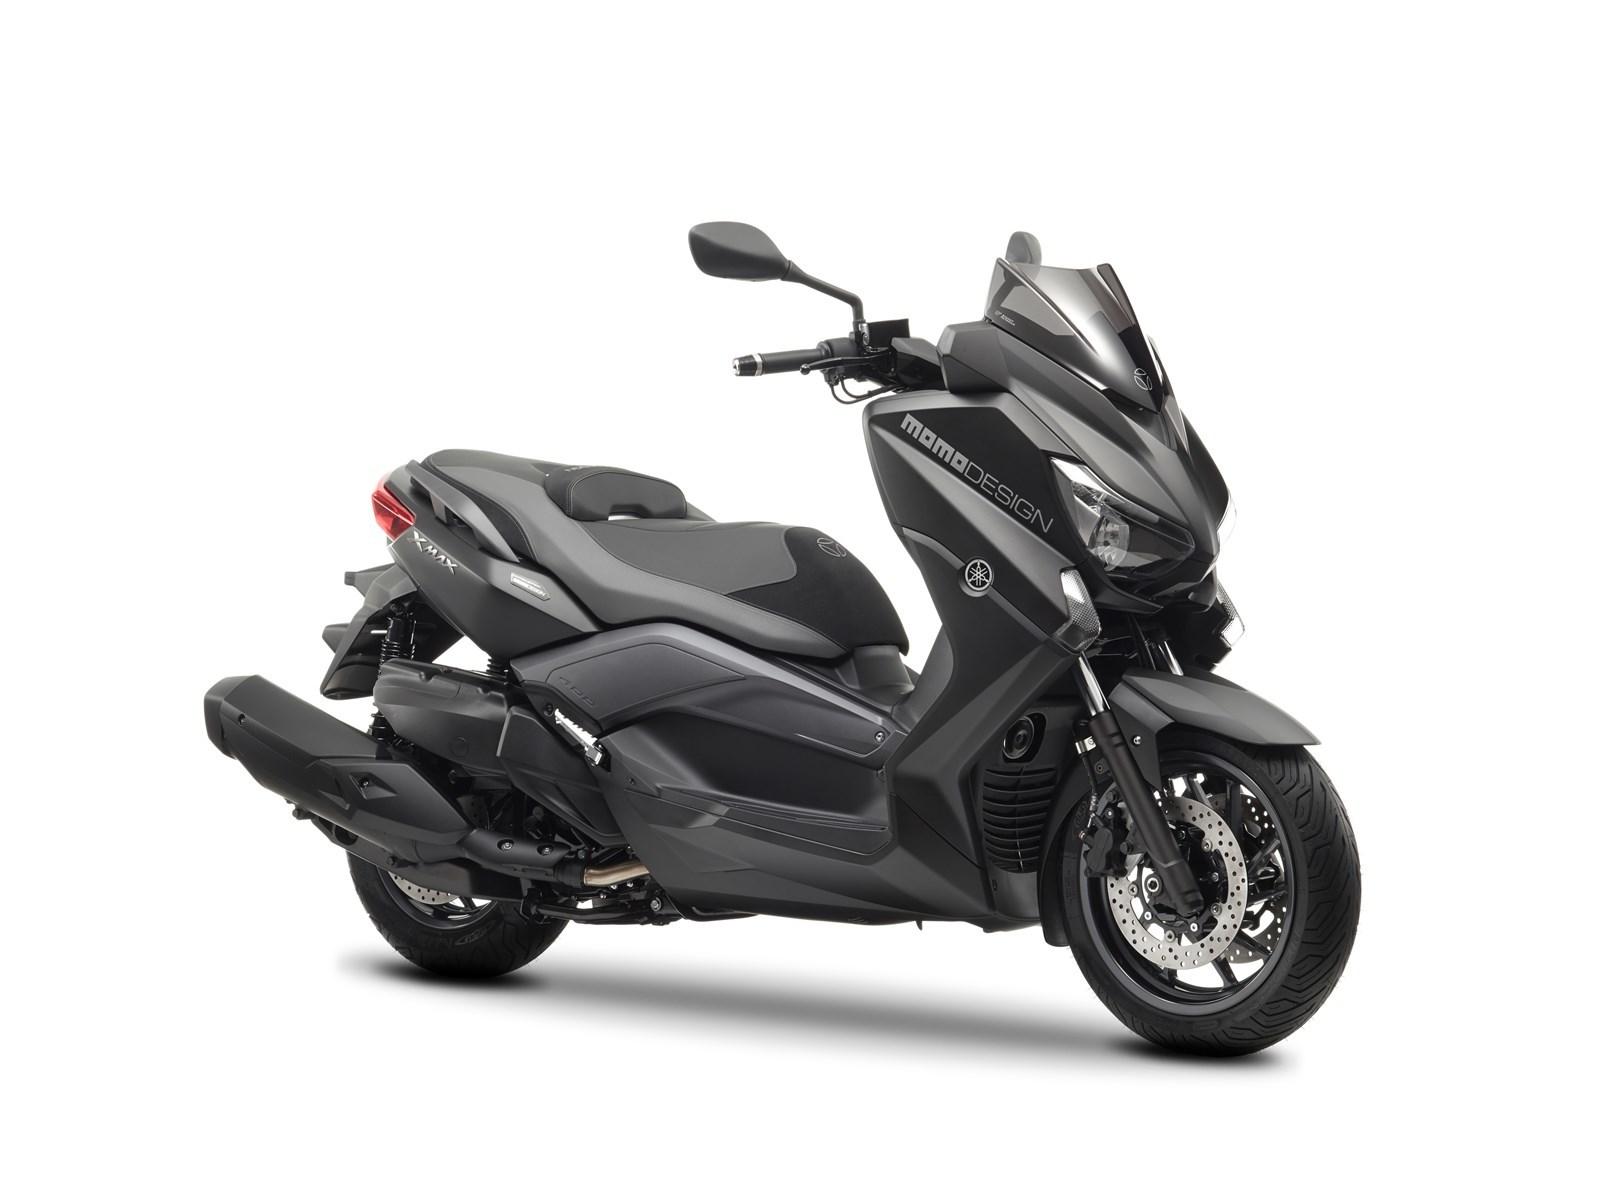 Yamaha X-MAX 400 MOMODESIGN, estudio y detalles